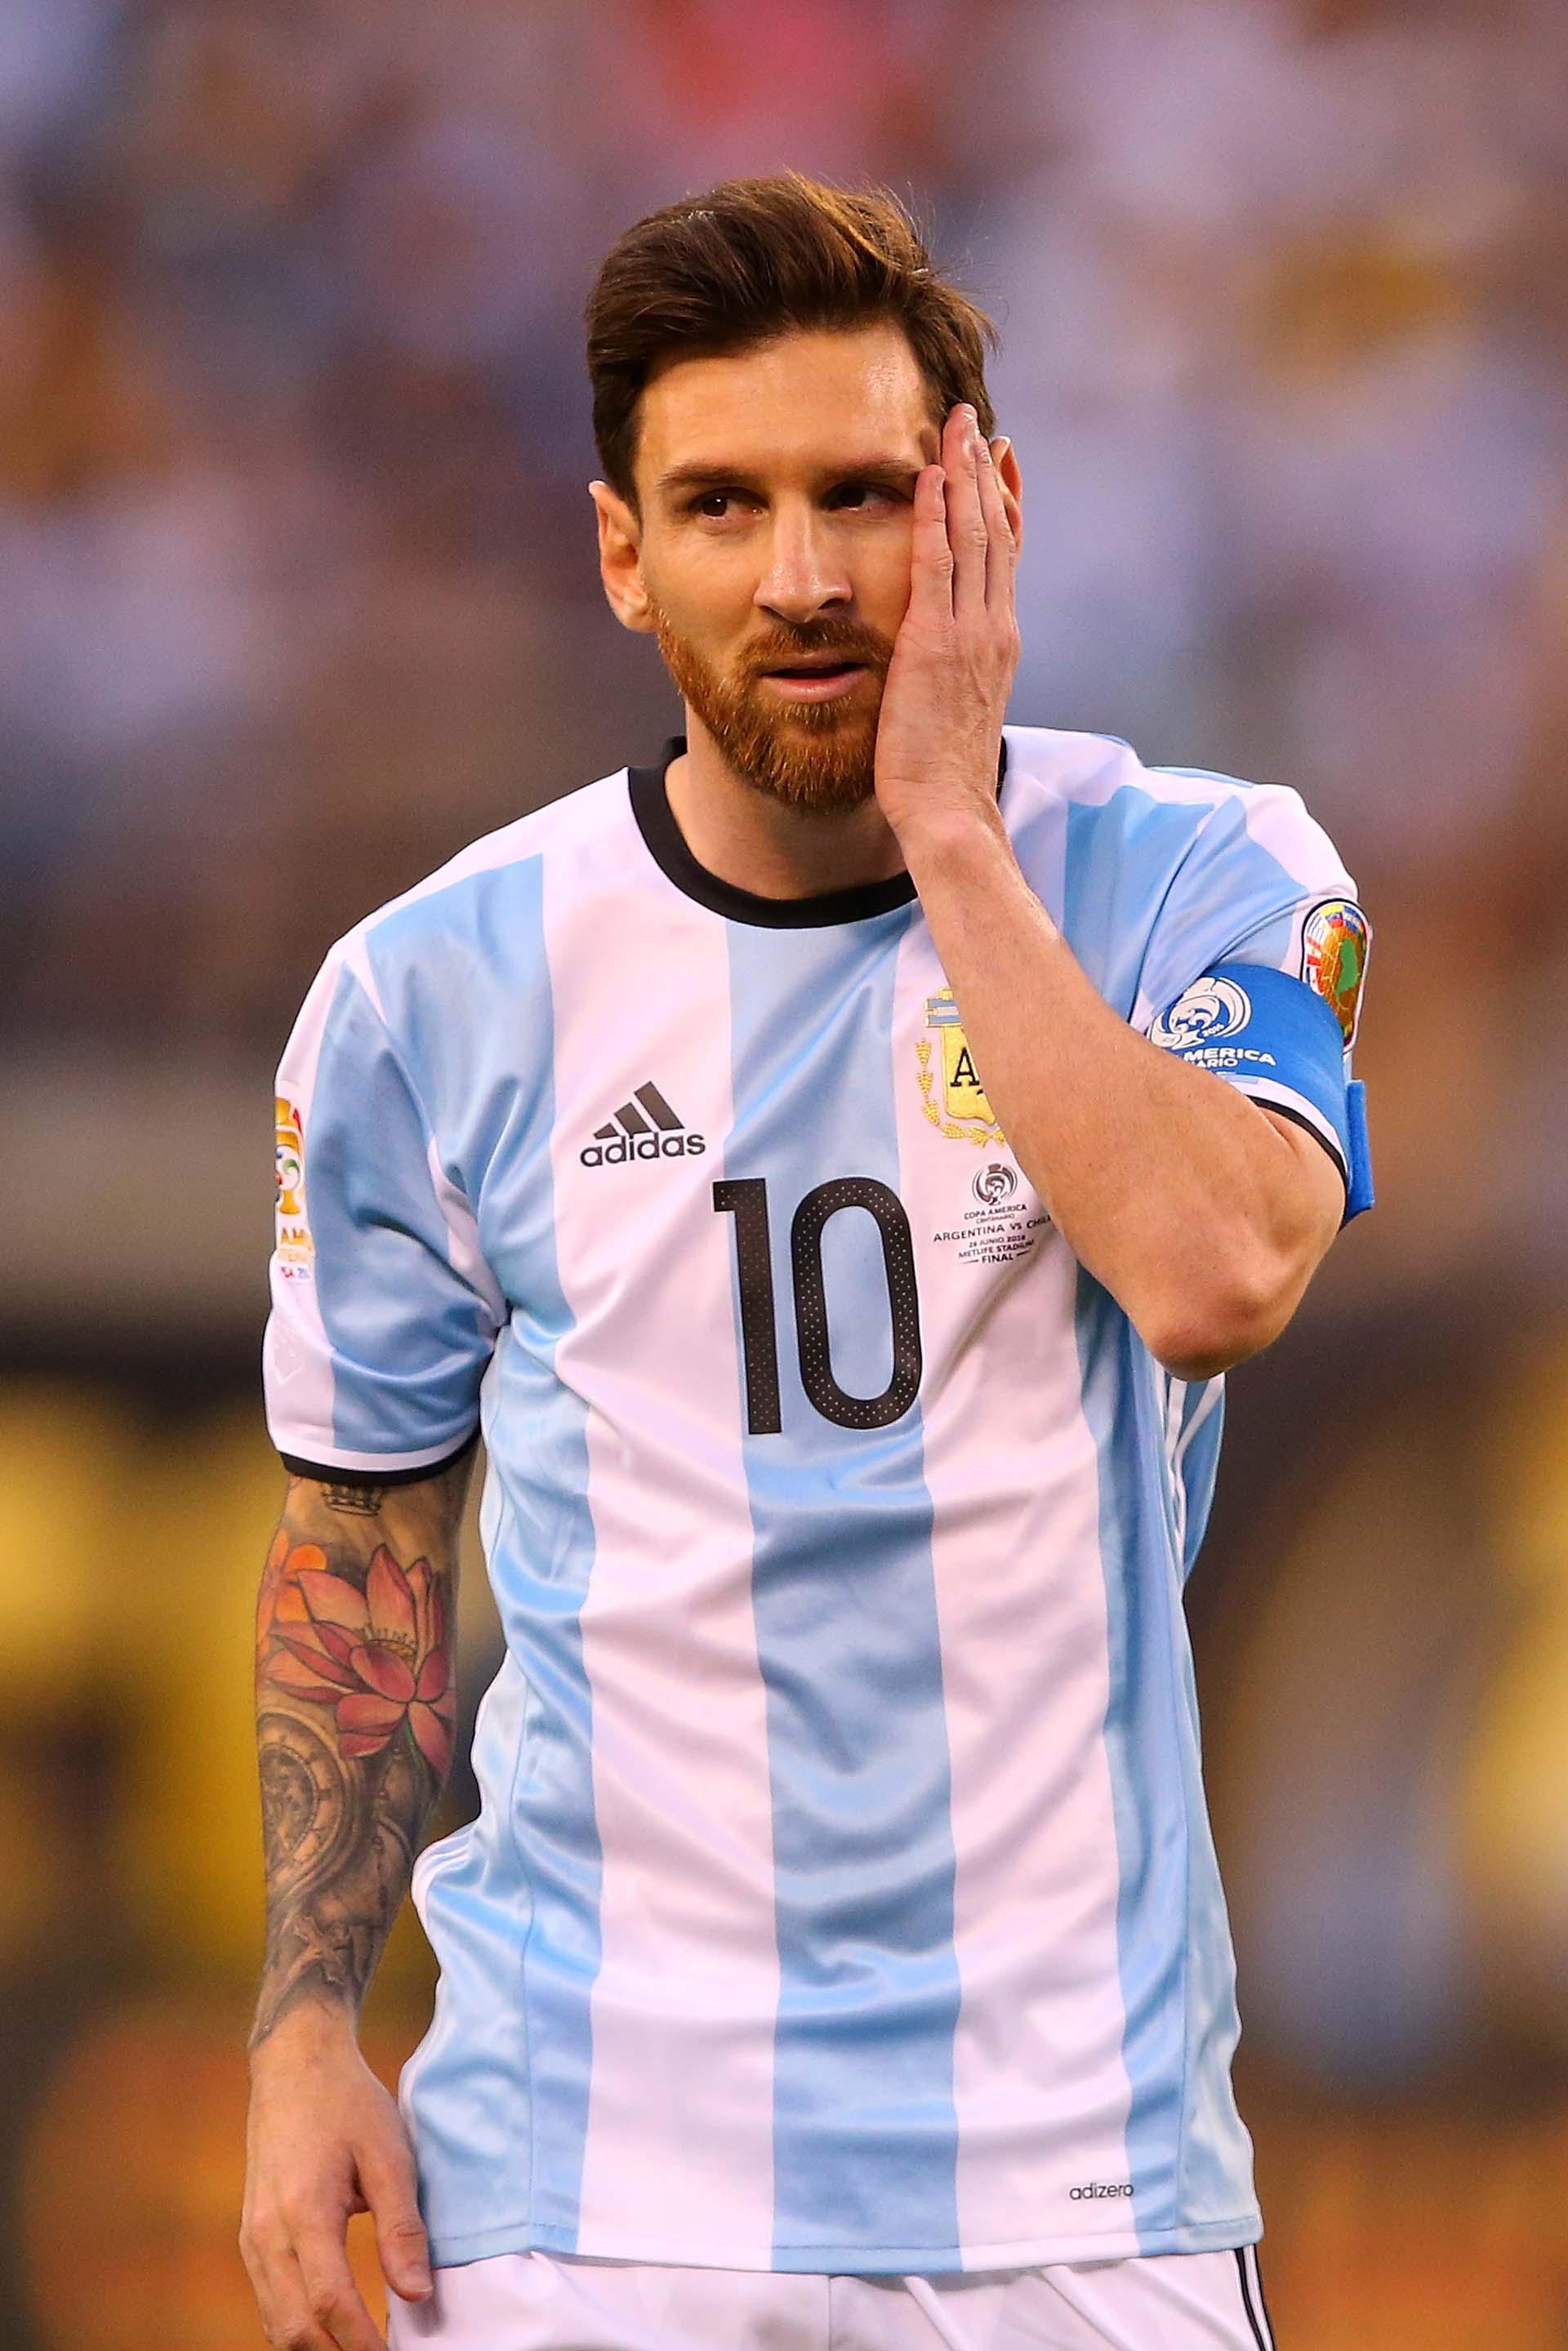 El llanto de Messi tras errar el penal (AFP)